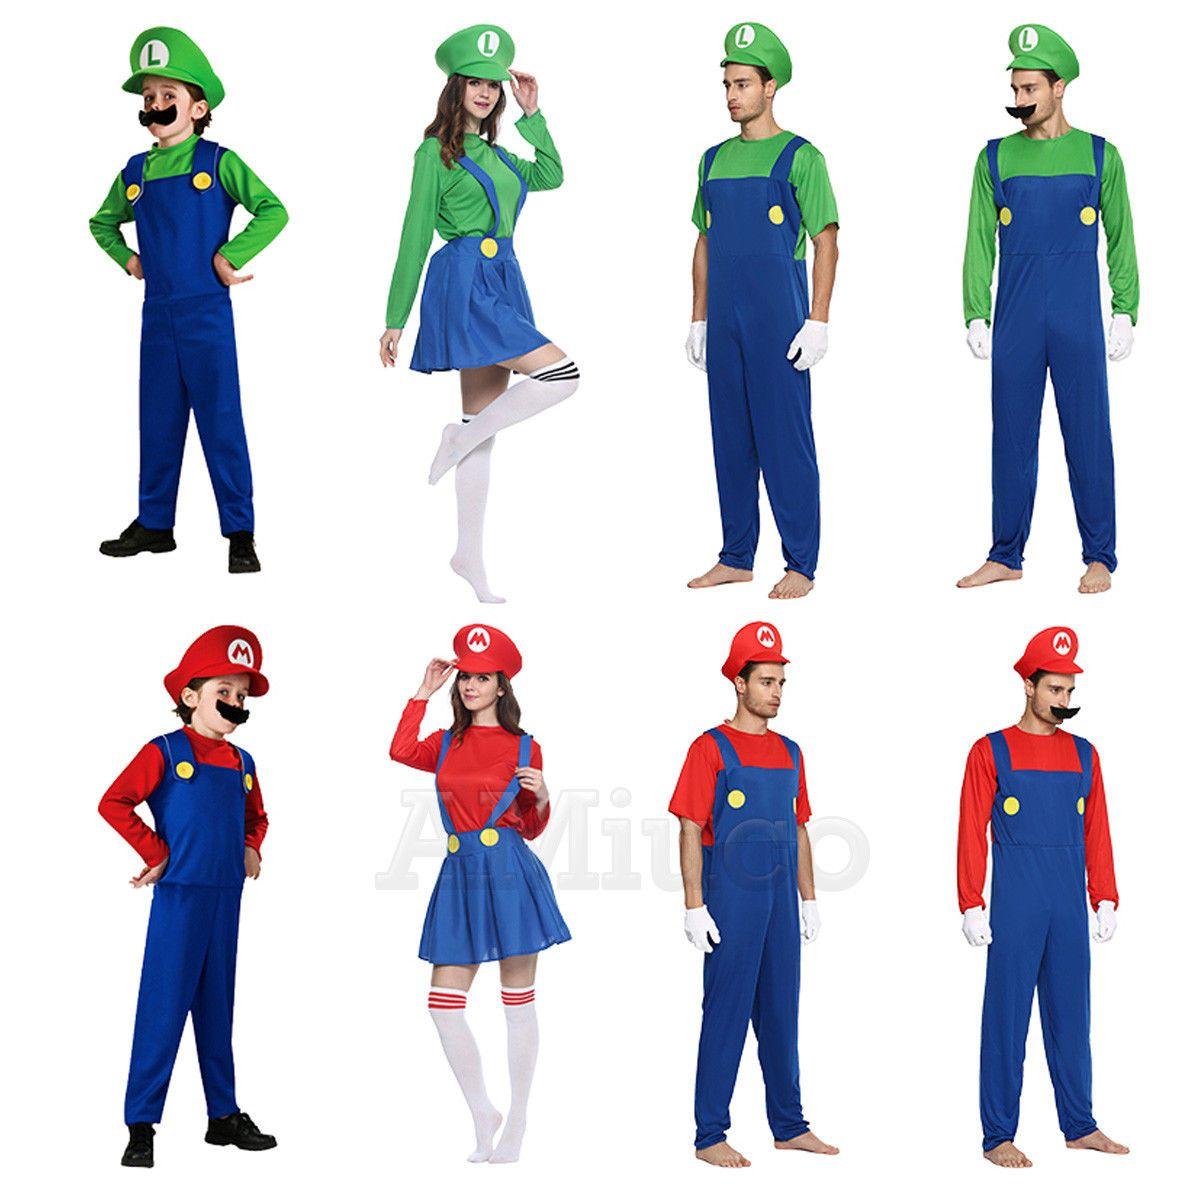 Mario /& Luigi Costumes Adult Kids Super Mario Bros Halloween Cosplay Fancy Dress